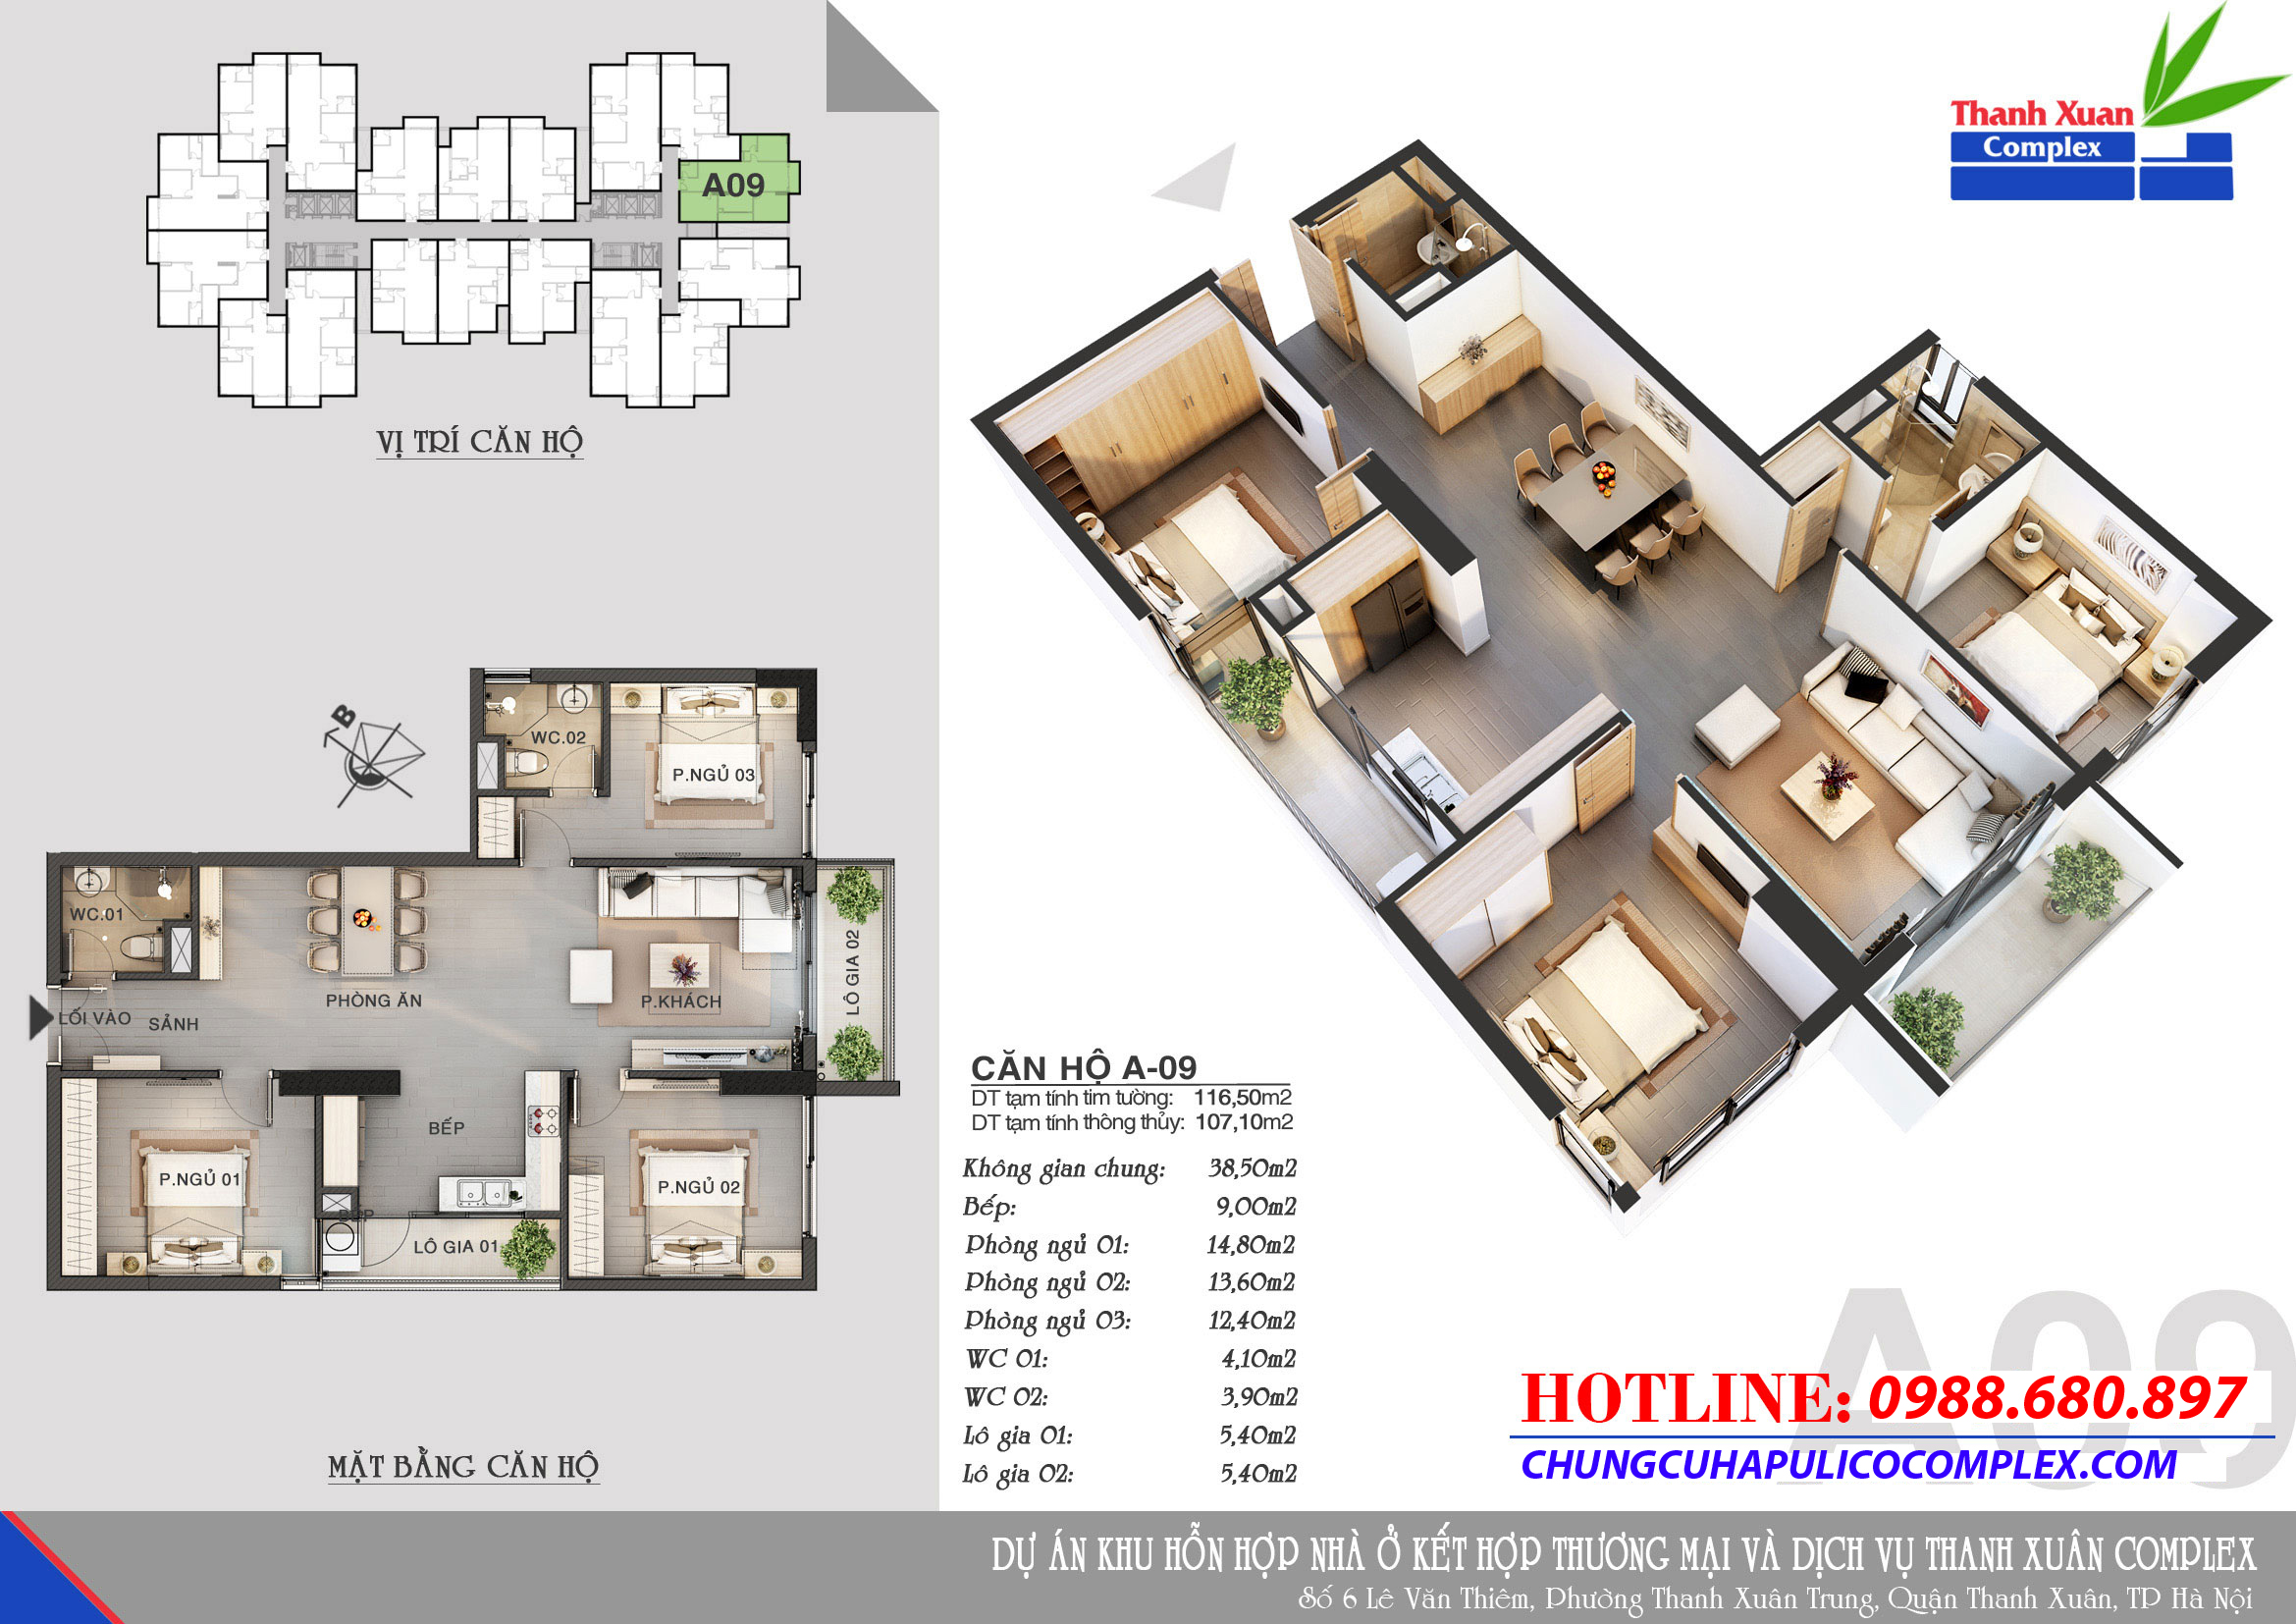 HSB_Thanhxuan-complex_CH-A09_suachotT42016-copy